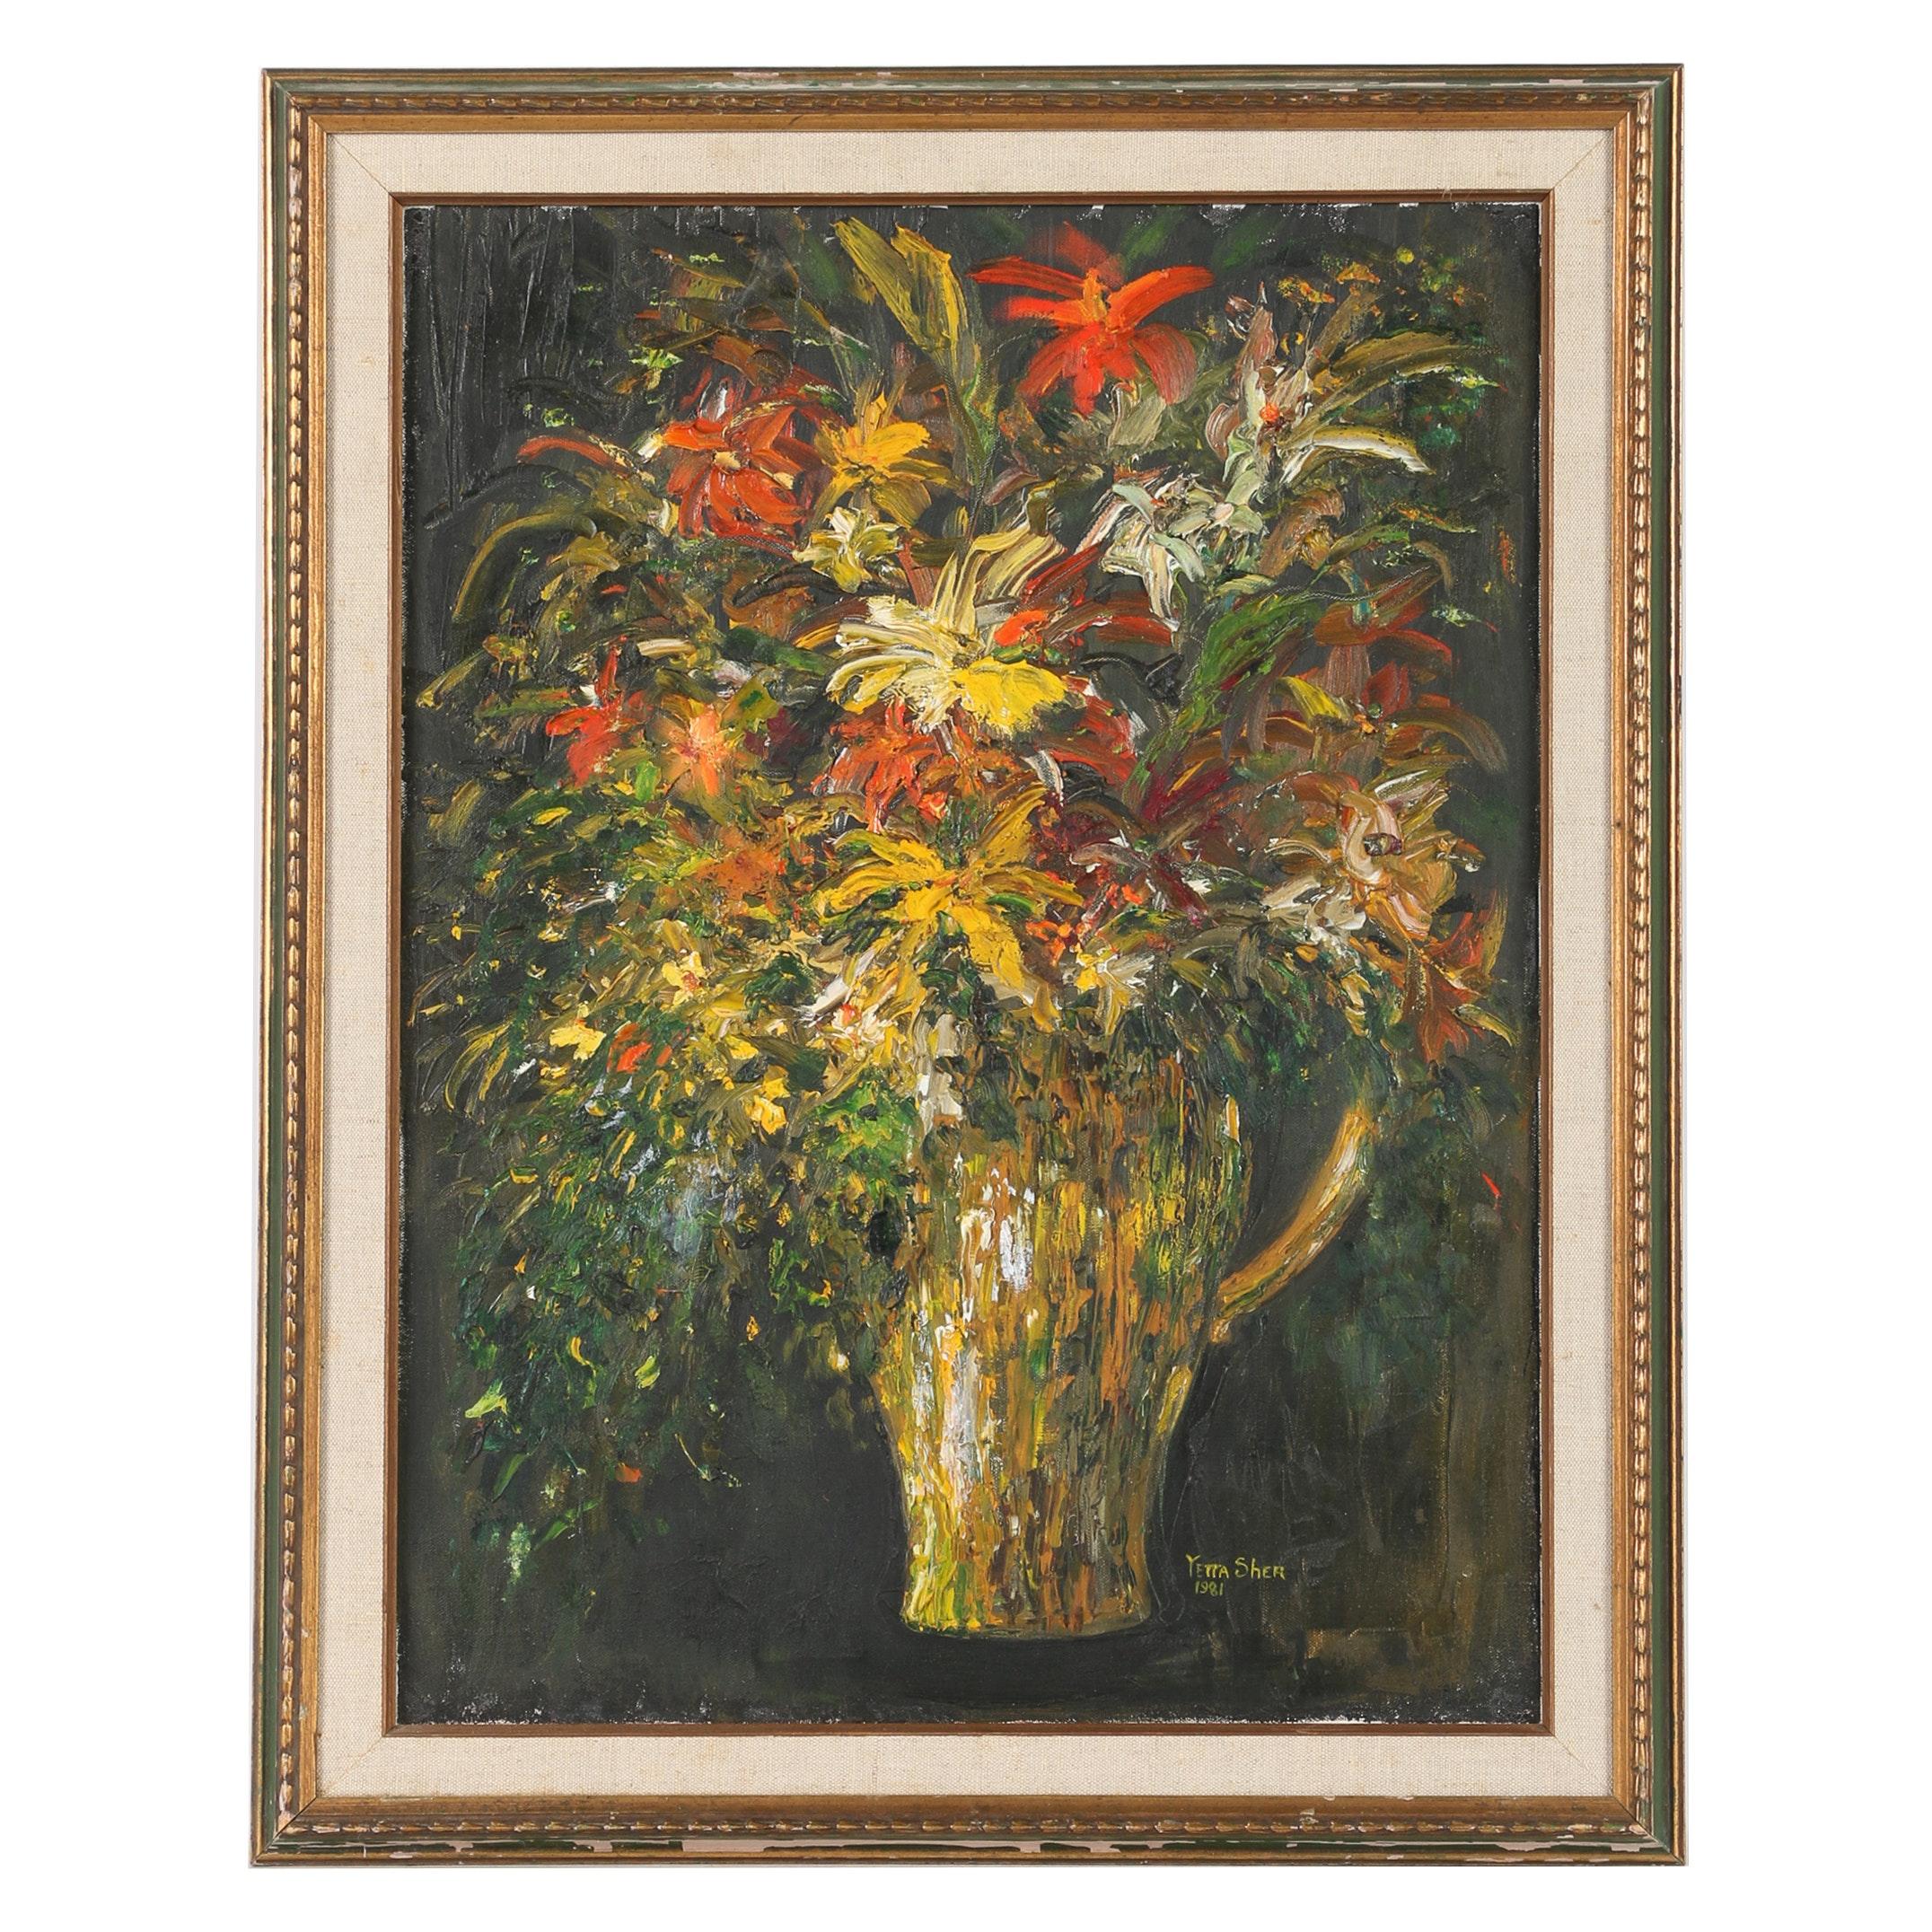 Yetta Sher Oil Painting